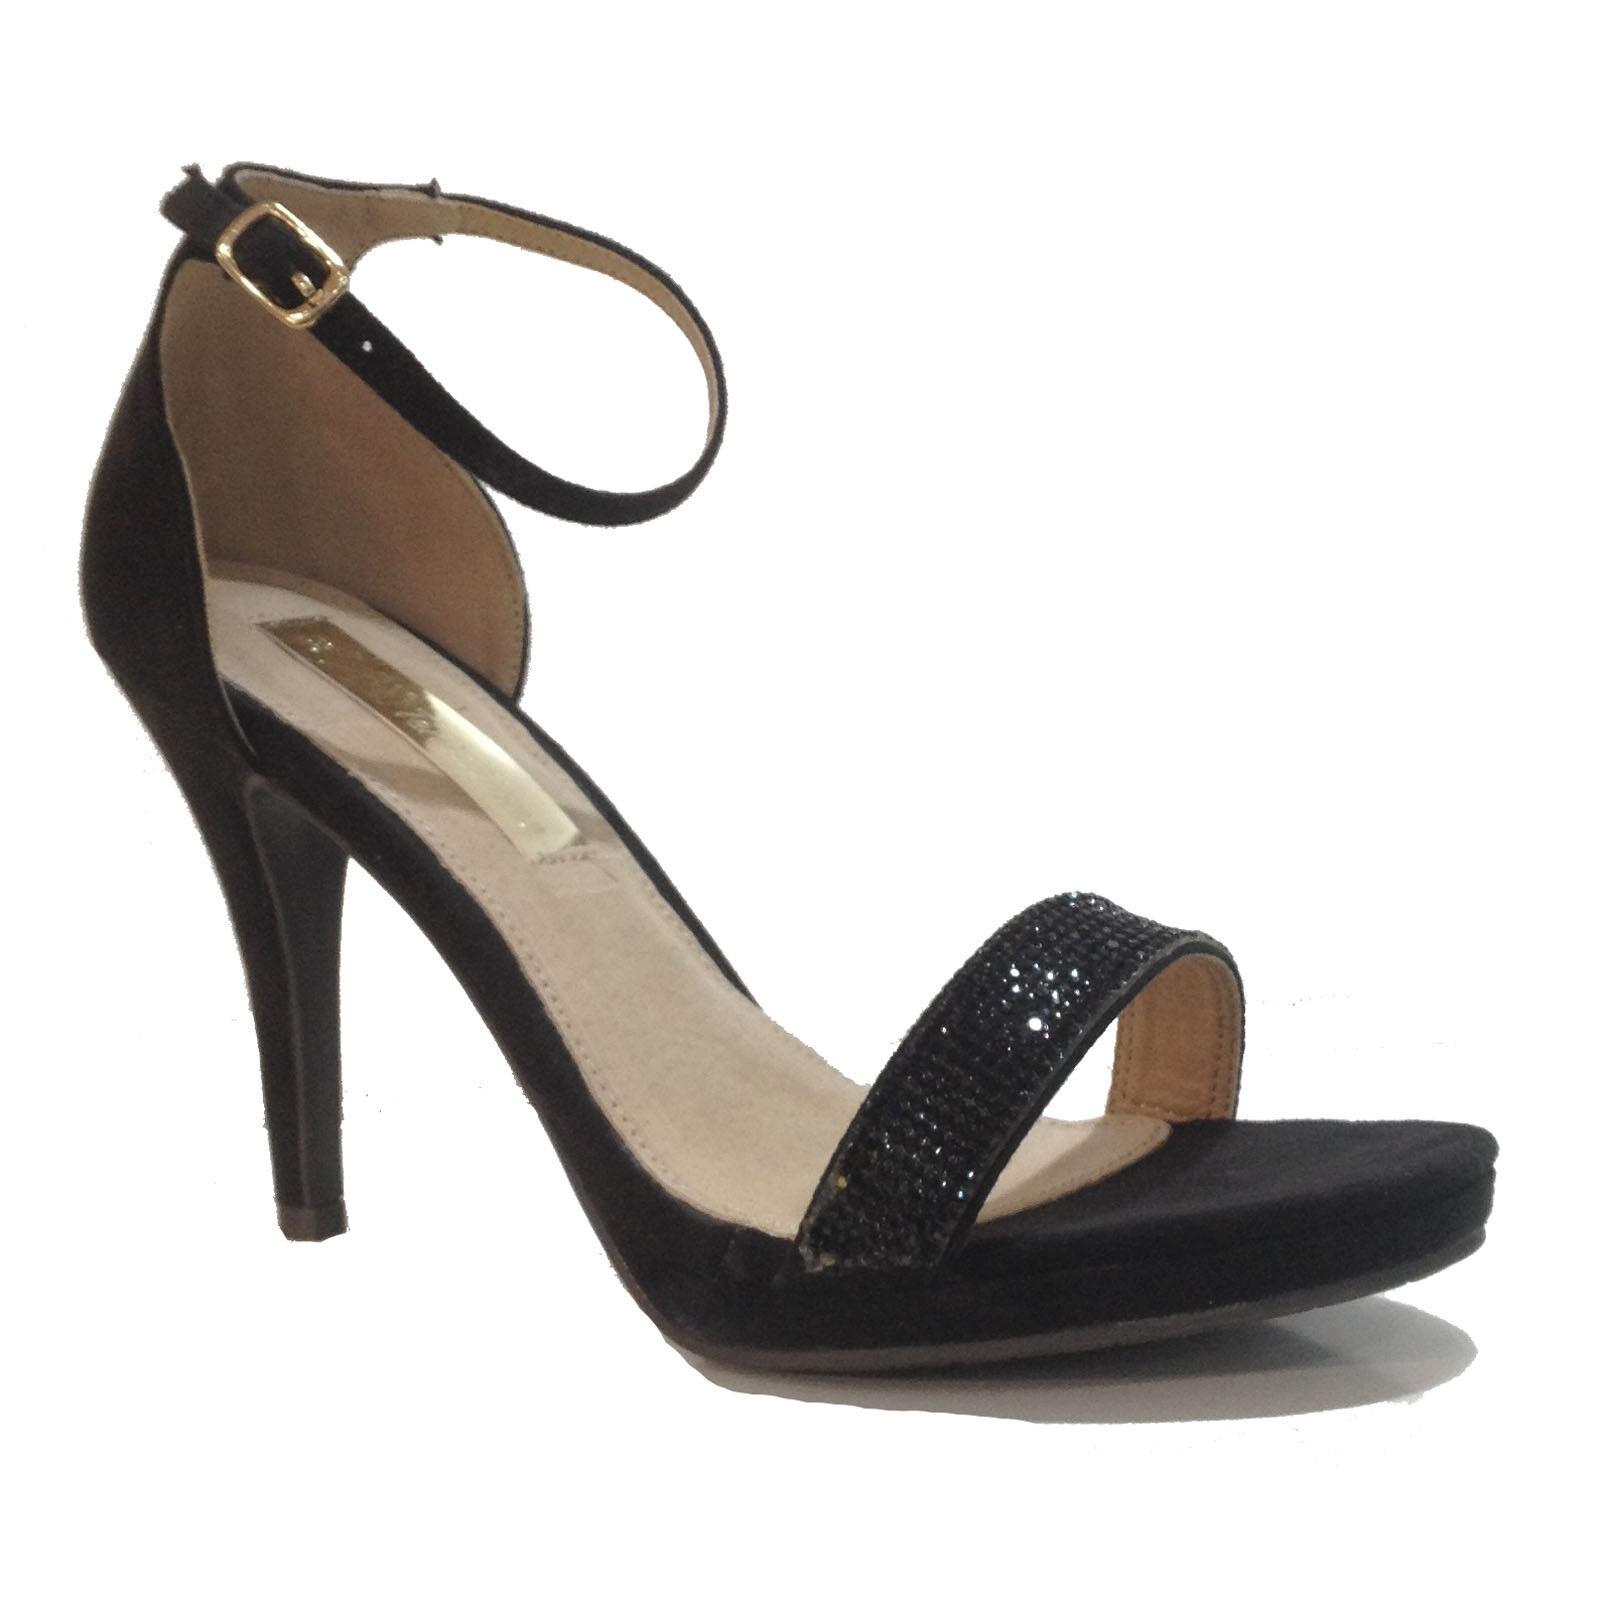 ☼ELEN☼ sandales à talons  -Xti- Ref  0813